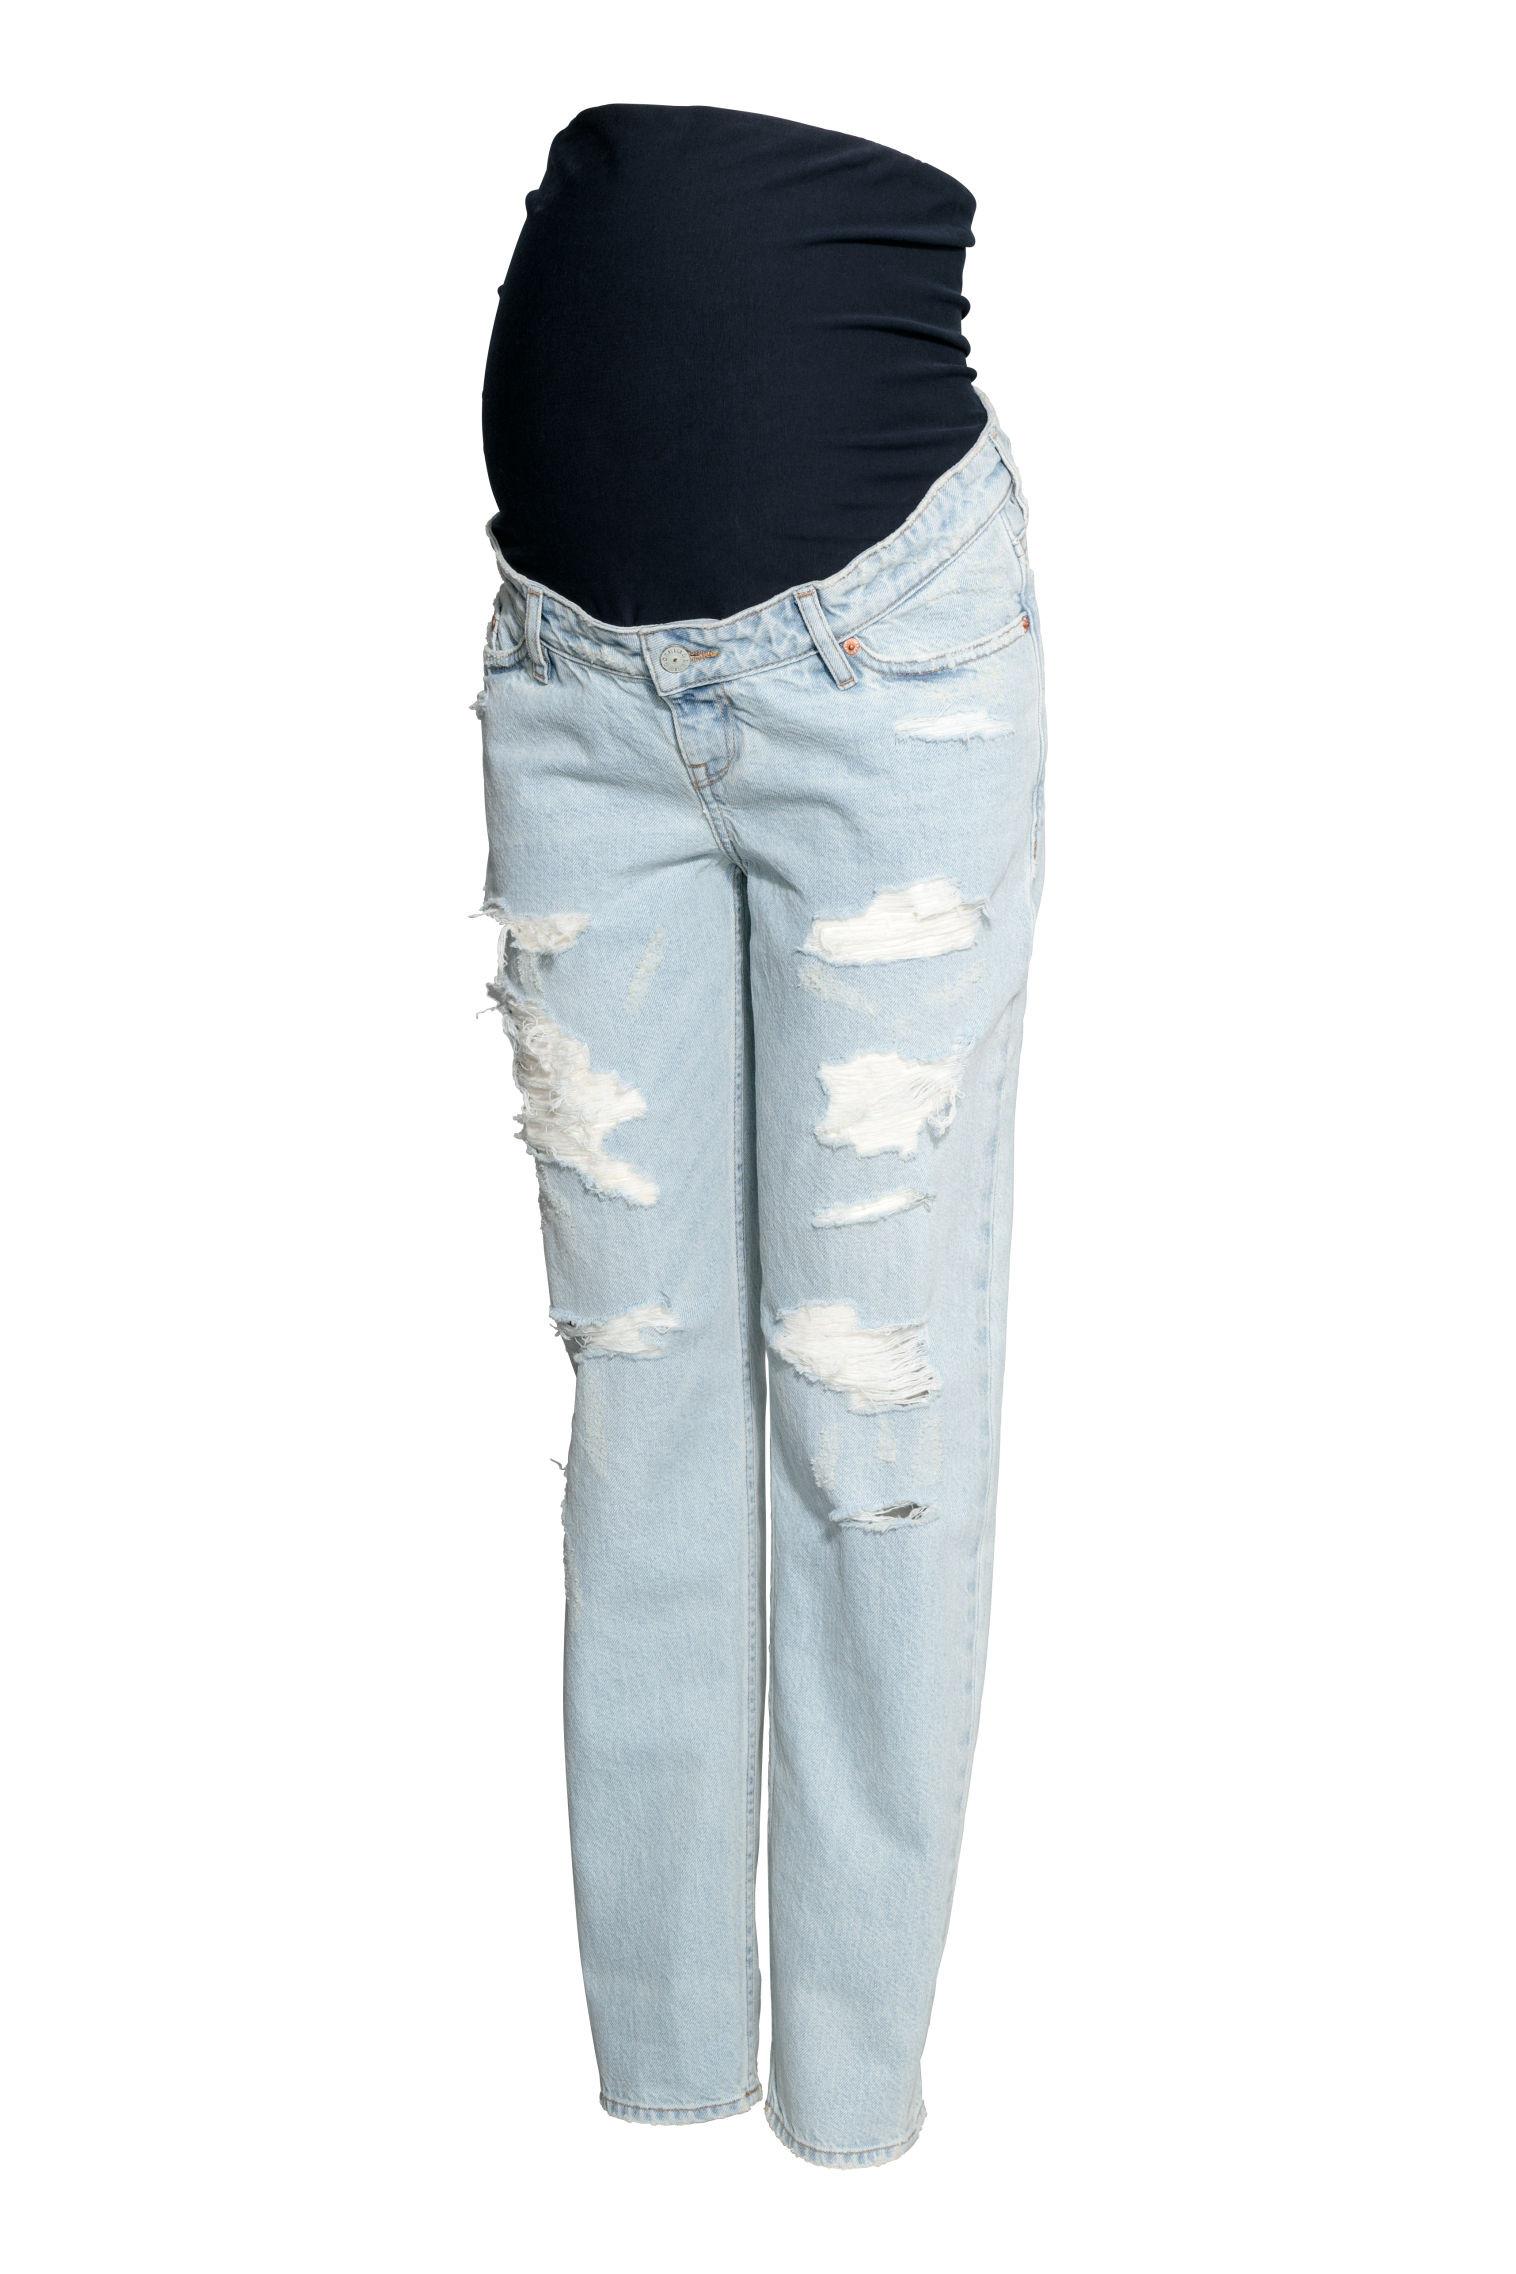 be40a8d4f4b7 Boyfriend Jeans Premaman H M   Recensioni